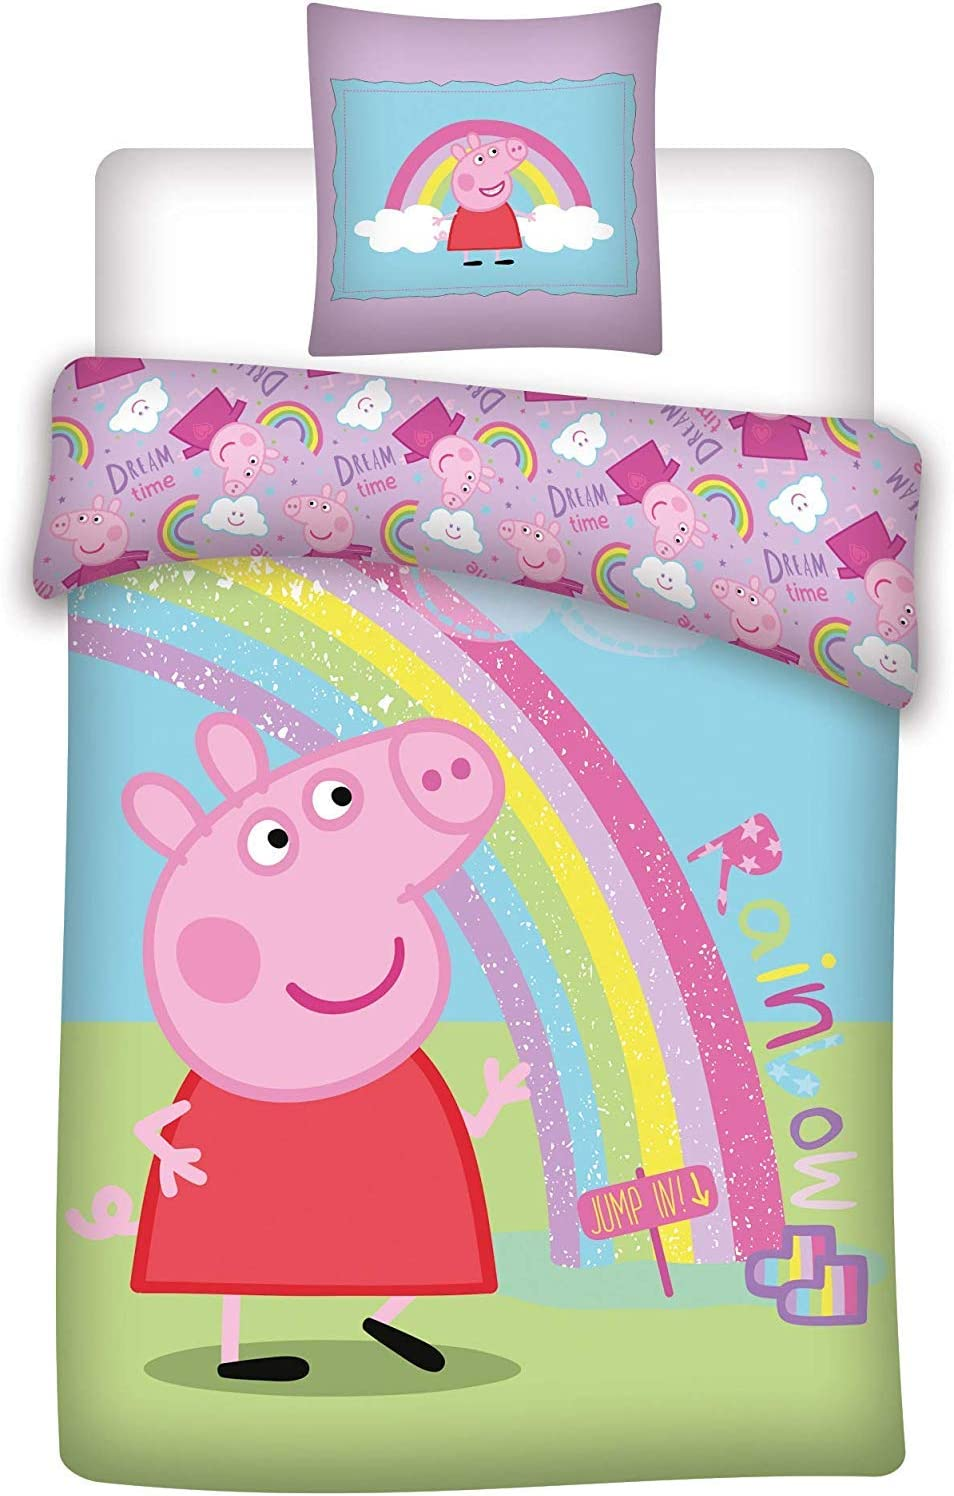 AYMAX S.P.R.L Peppa Pig - Juego de Cama Infantil (Funda de edredón ...